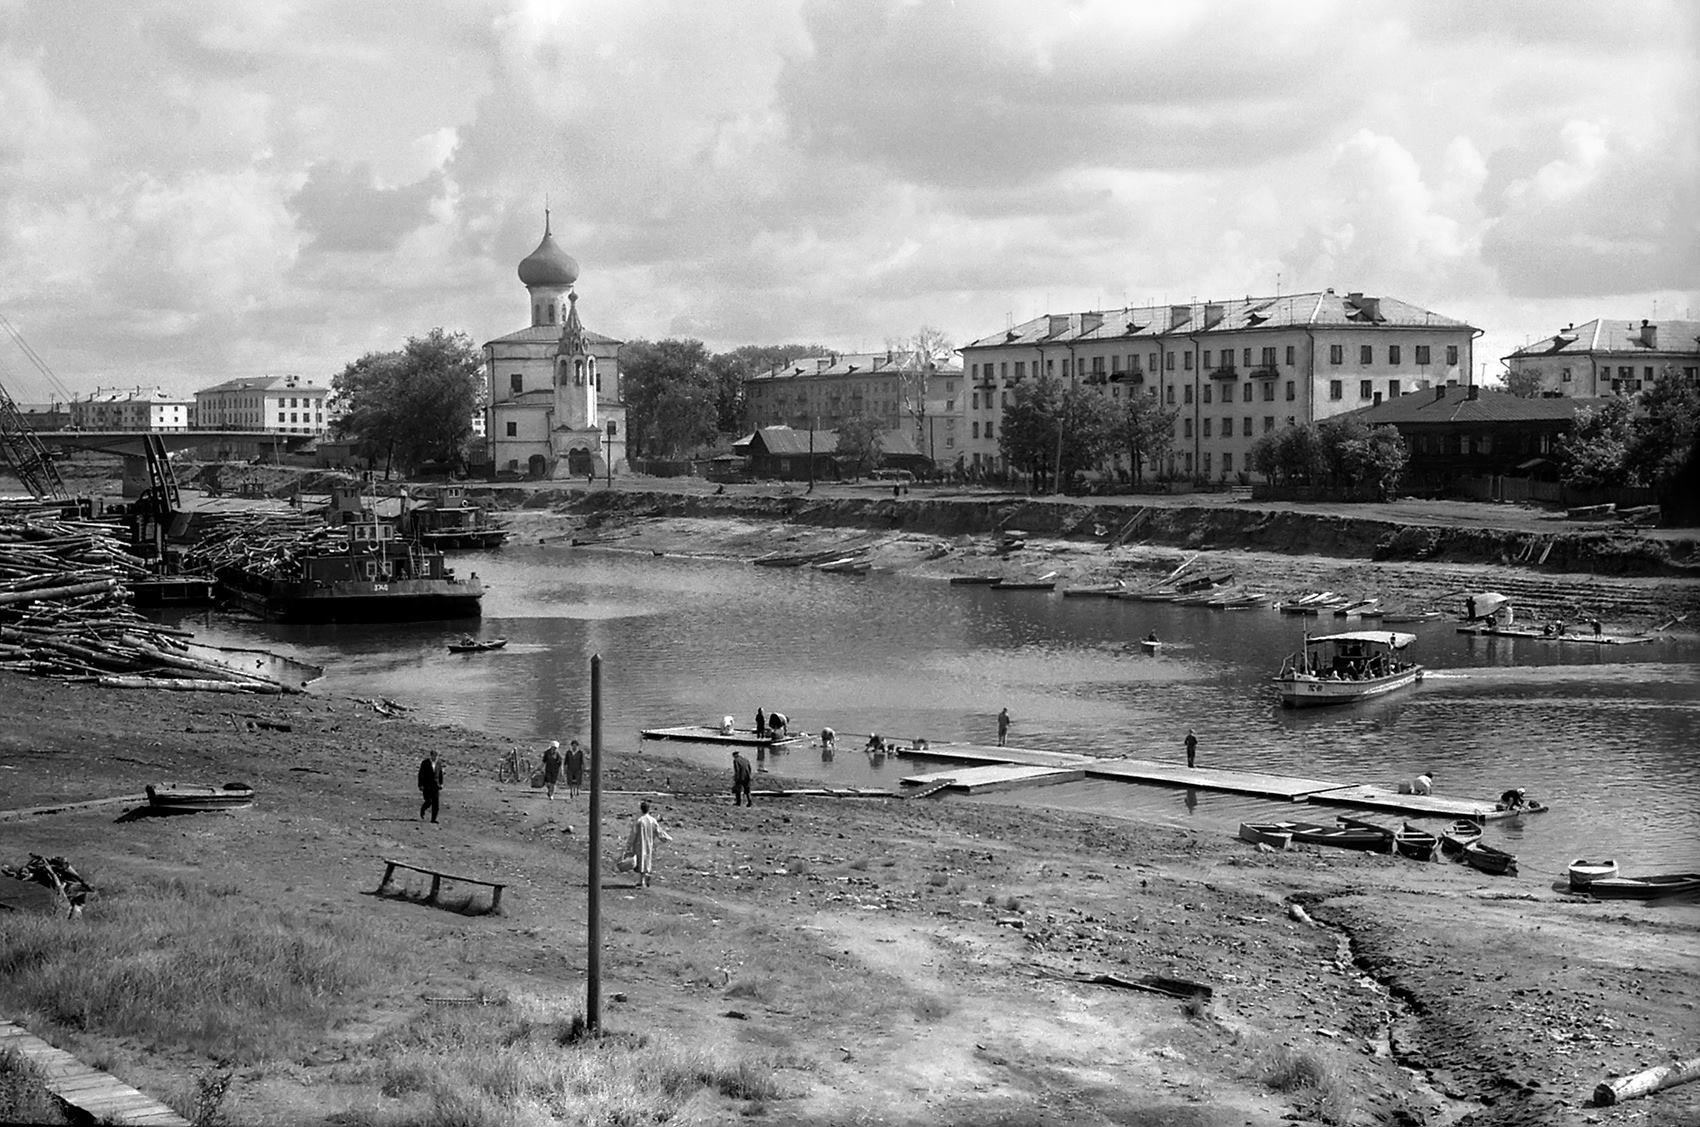 Вологда, нач. 70-х. Фото К.К.Доррендорфа